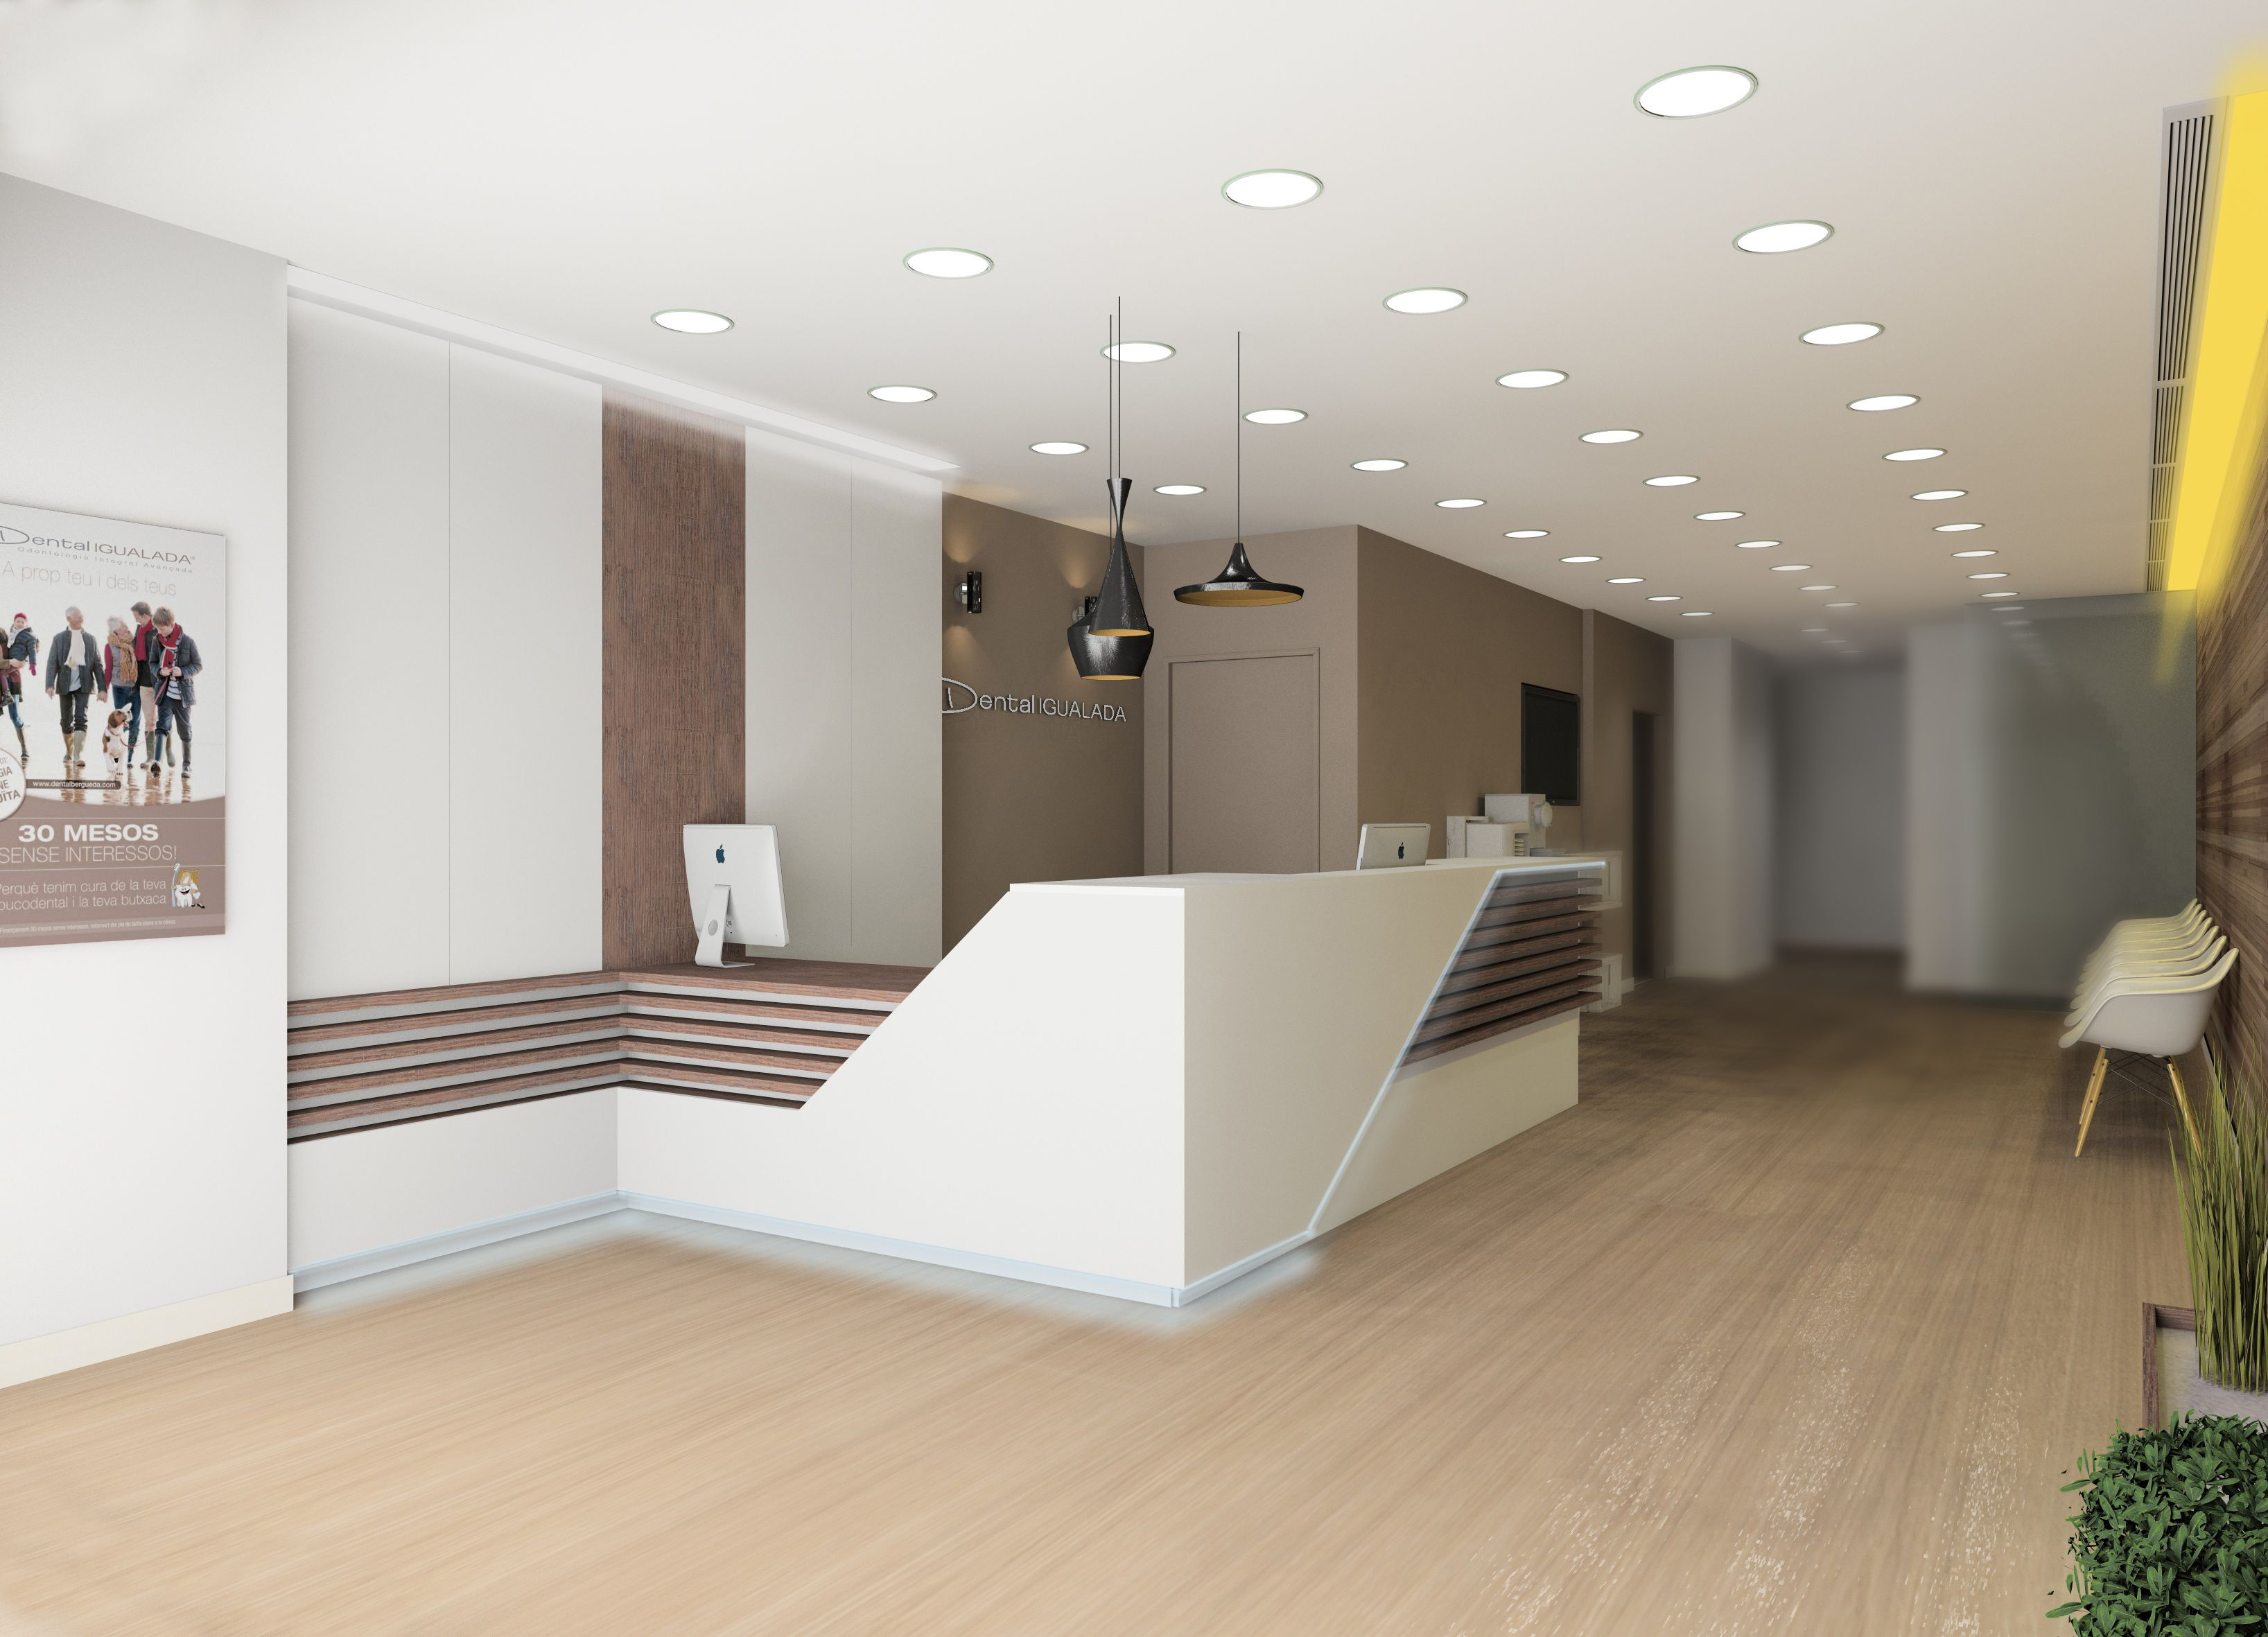 Reception Desk Idea Interior Design (Dental Clinic) by Paco Ortega ...